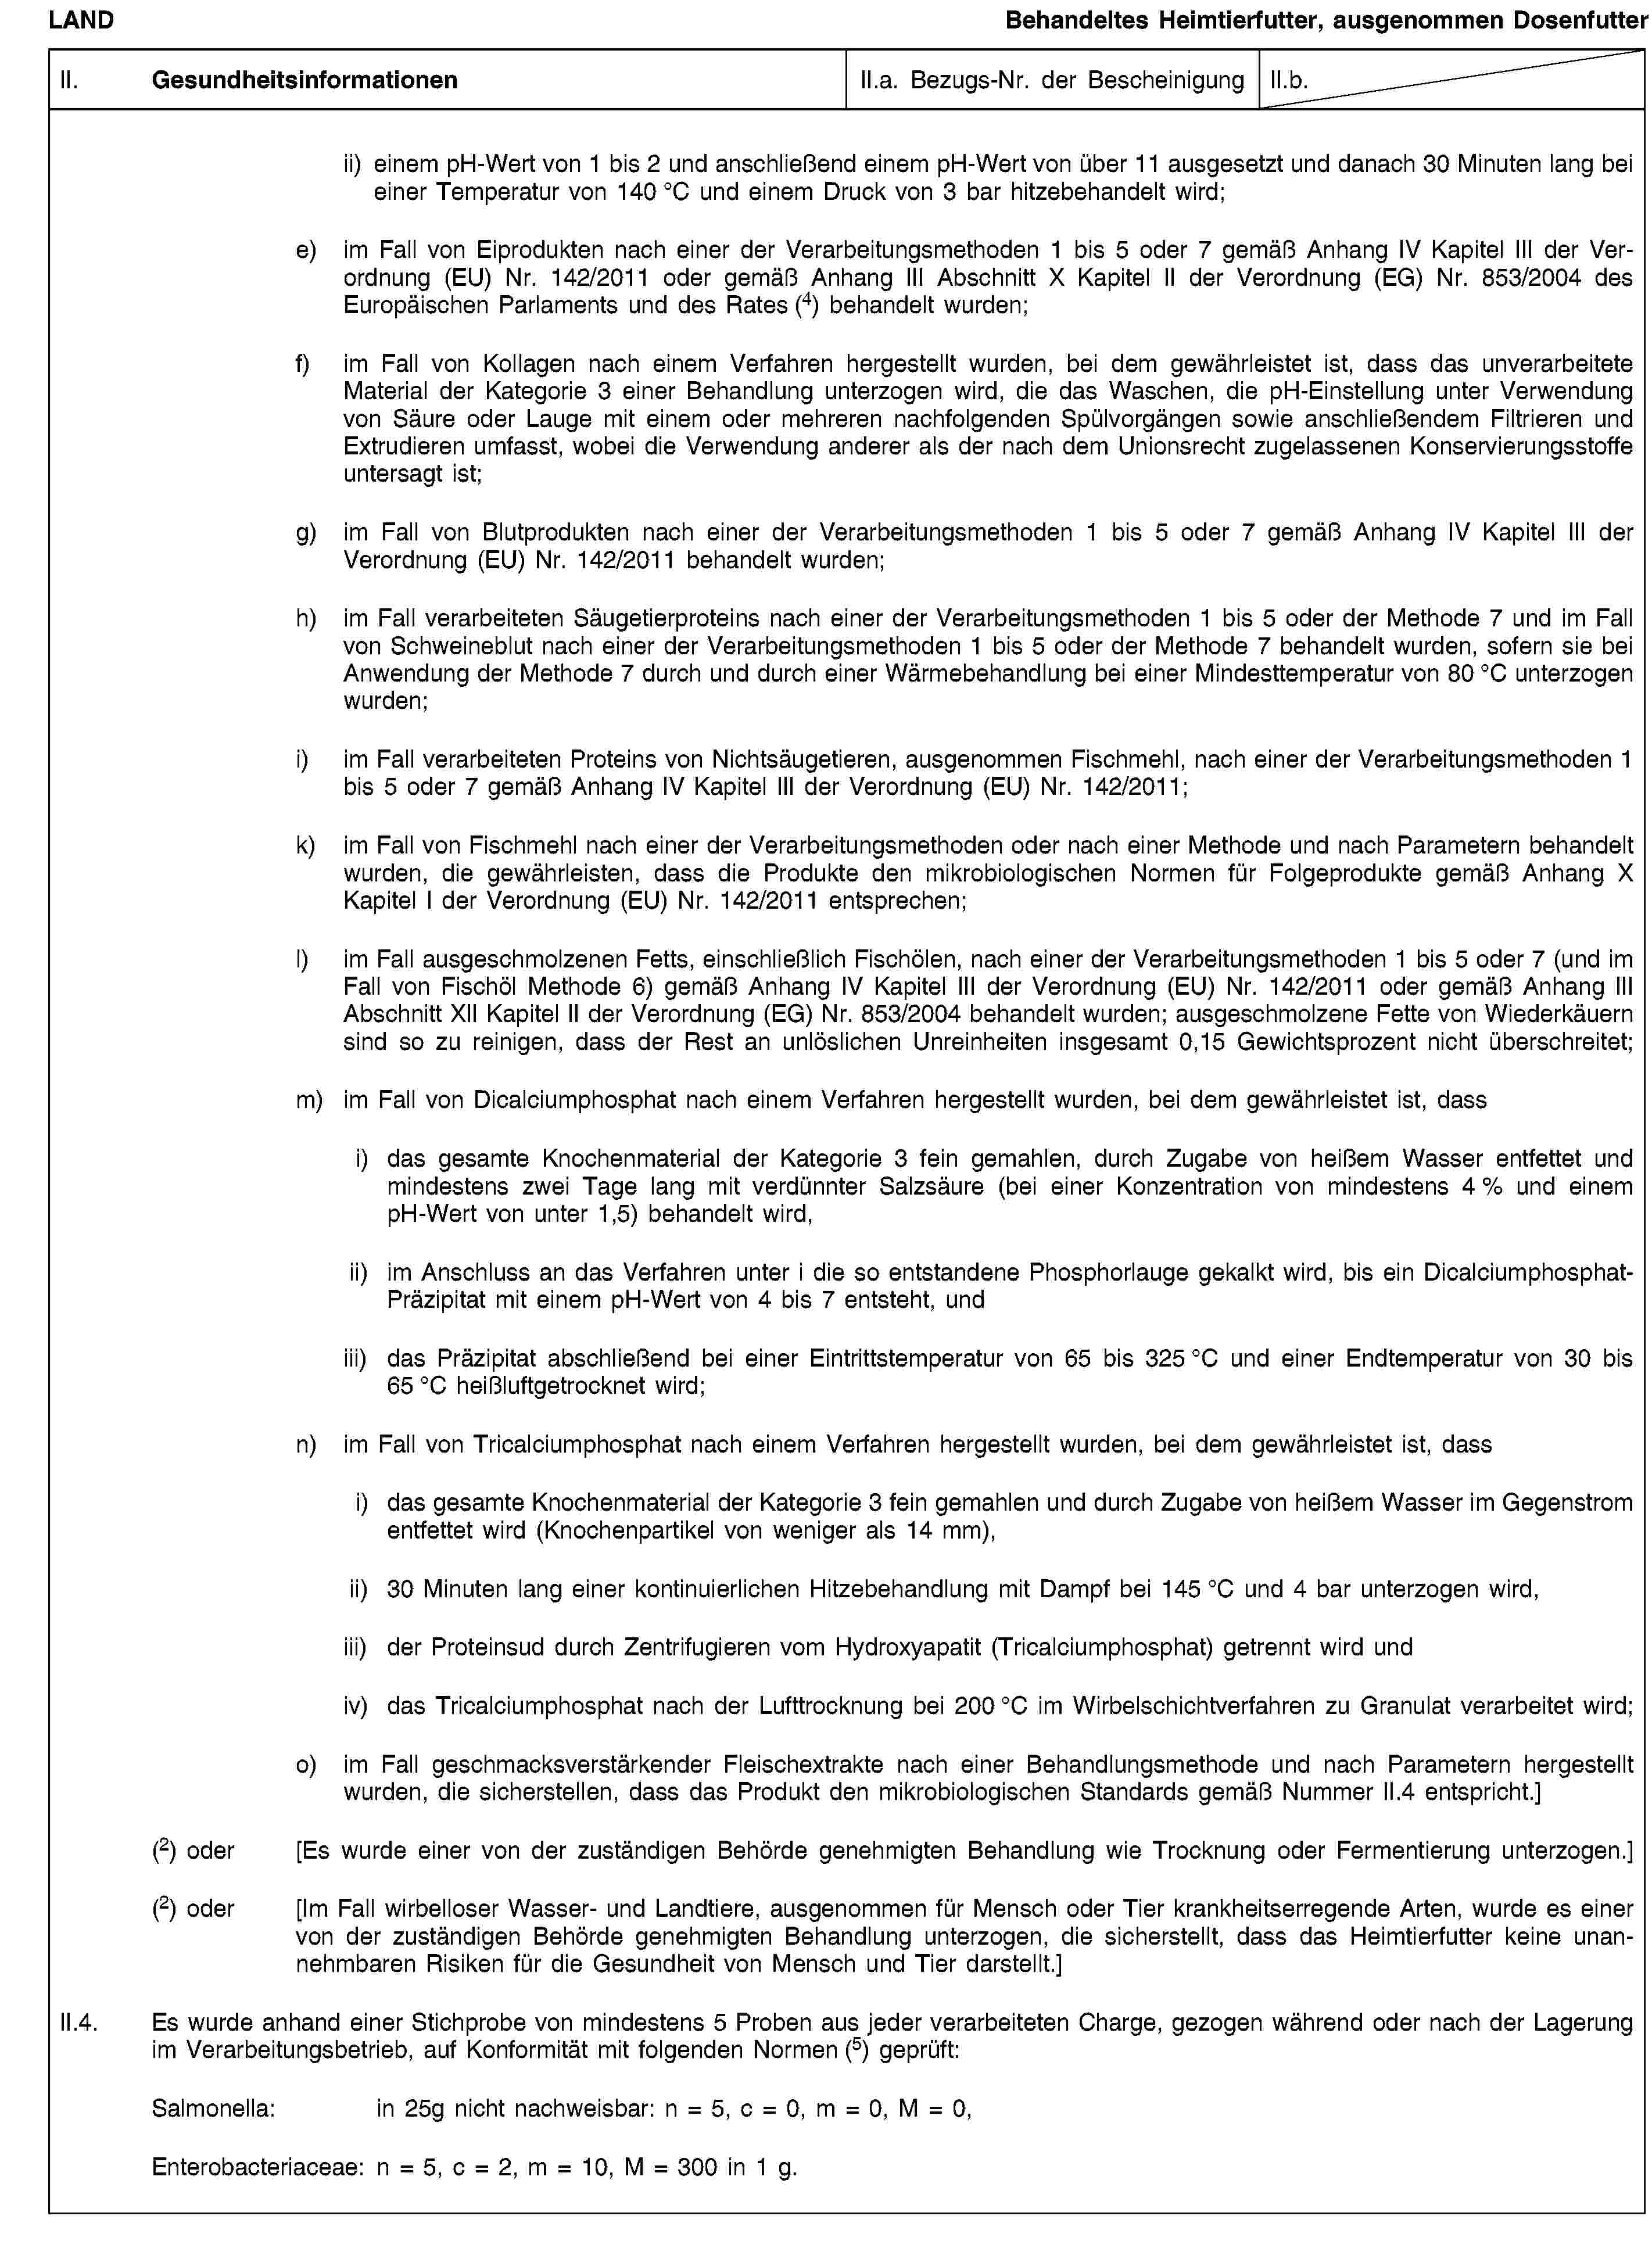 EUR-Lex - 02011R0142-20121204 - EN - EUR-Lex